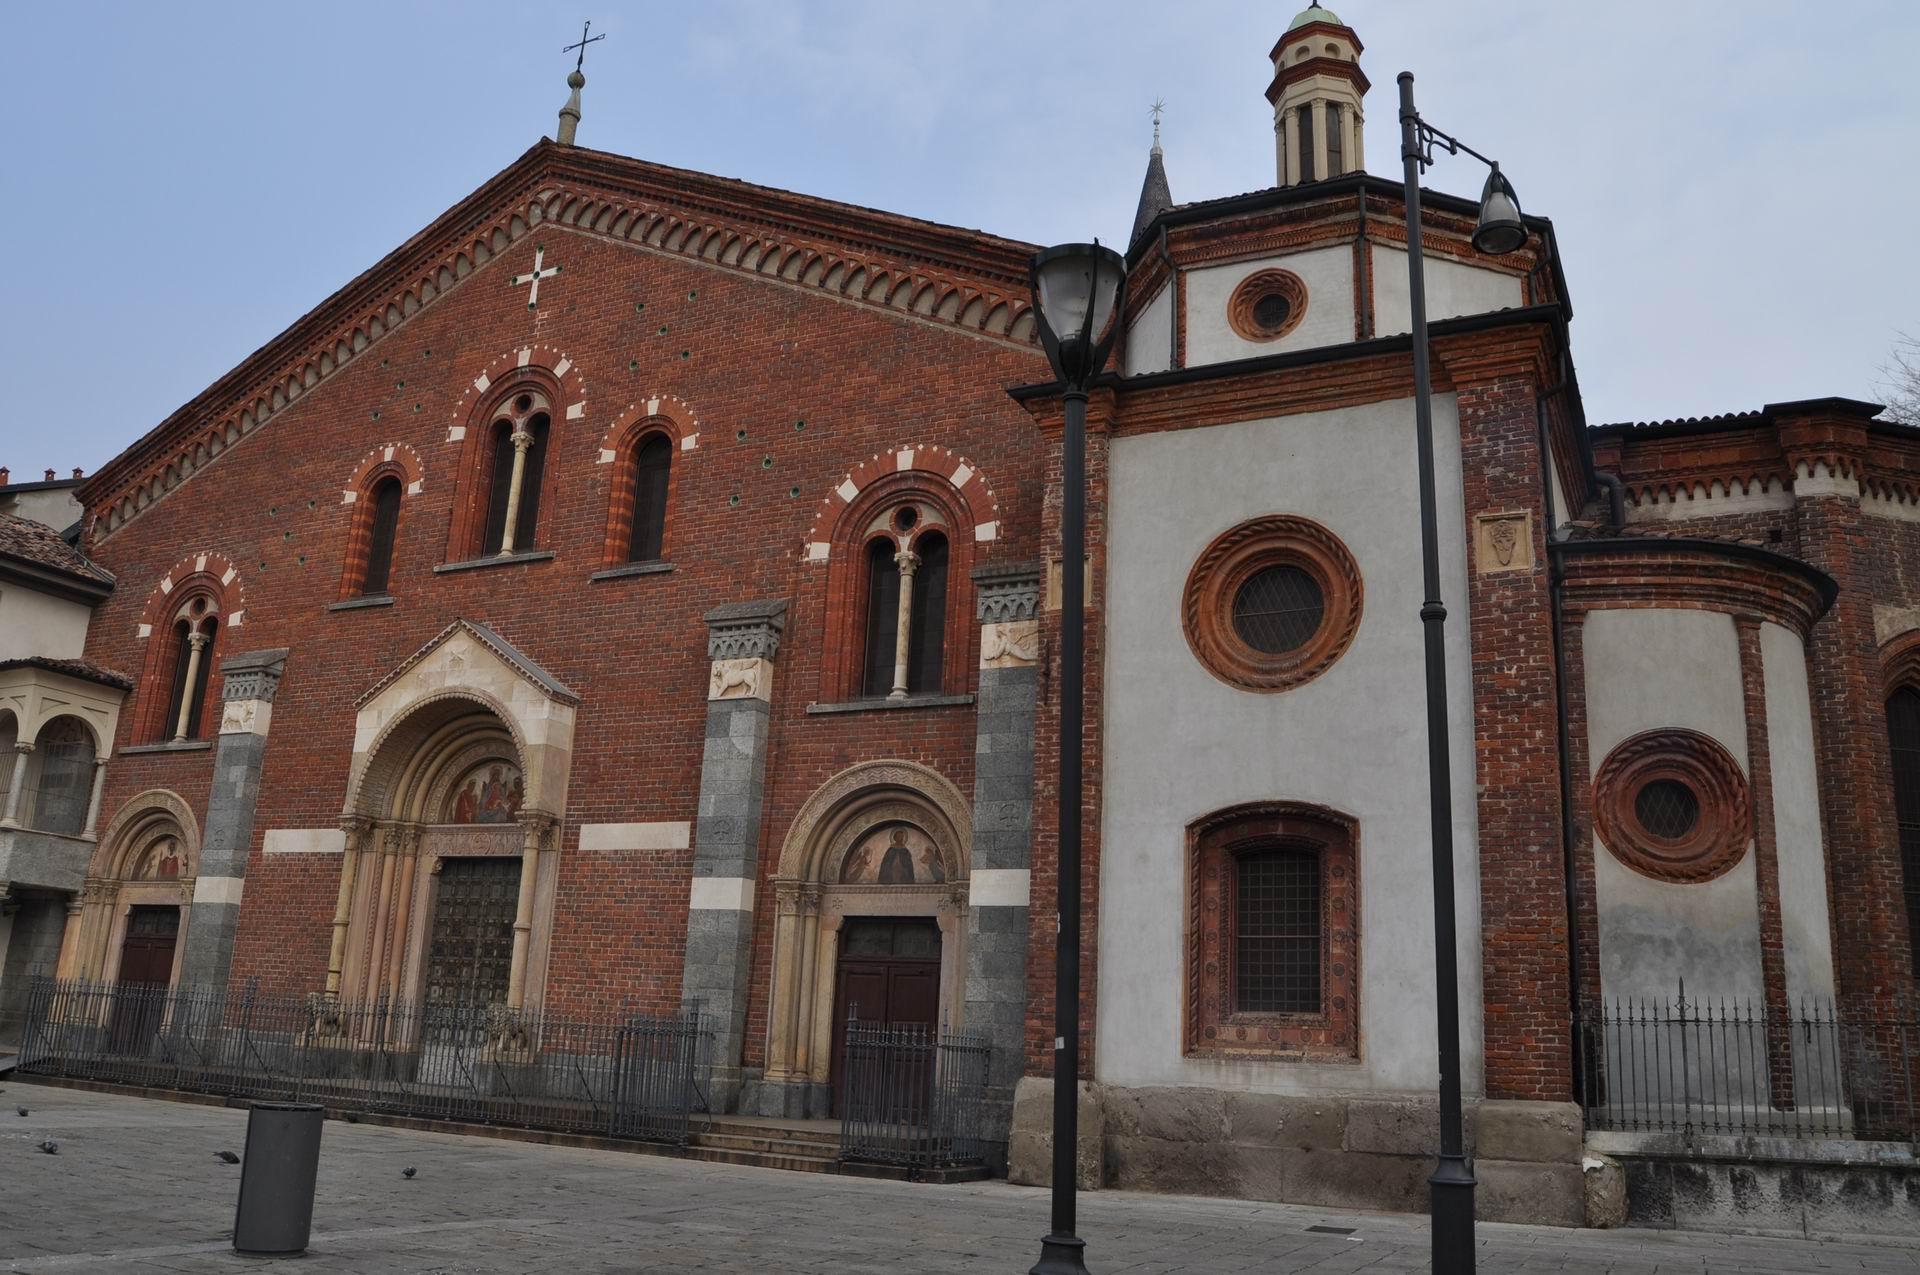 Visita gratuita alle tombe paleocristiane di sant for Piazza sant eustorgio